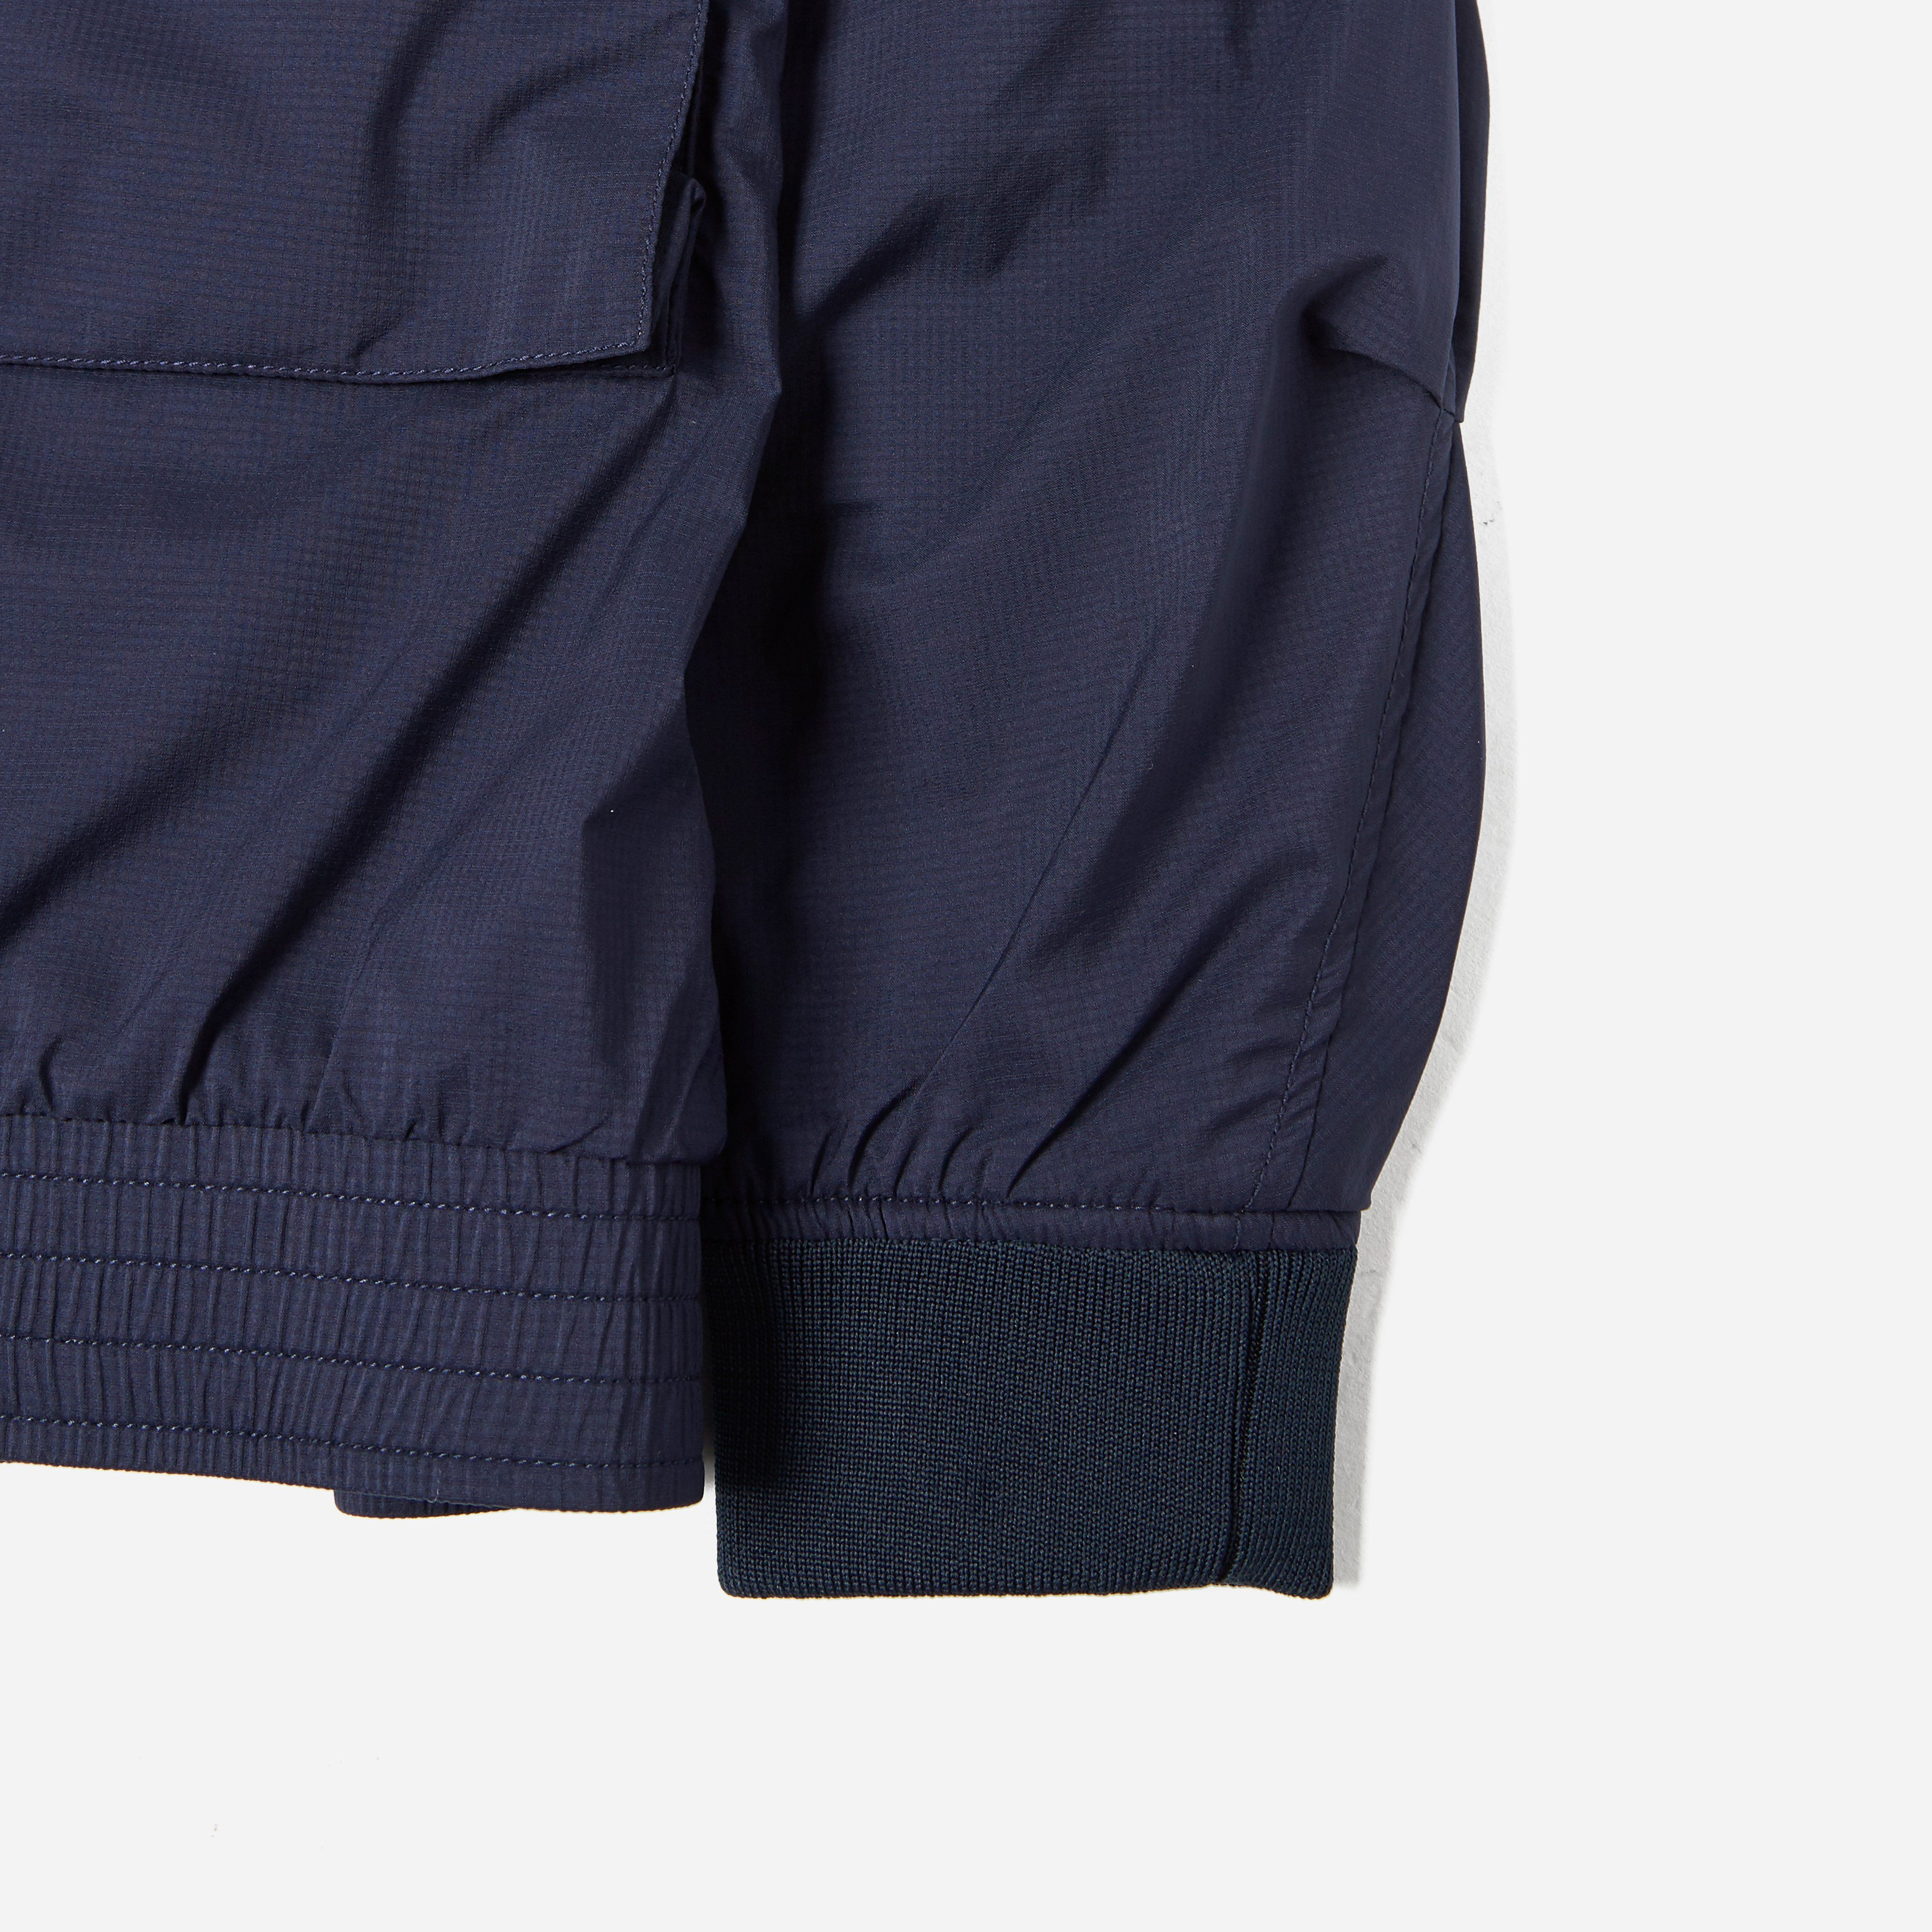 Beams Plus Nylon Ripstop Jacket